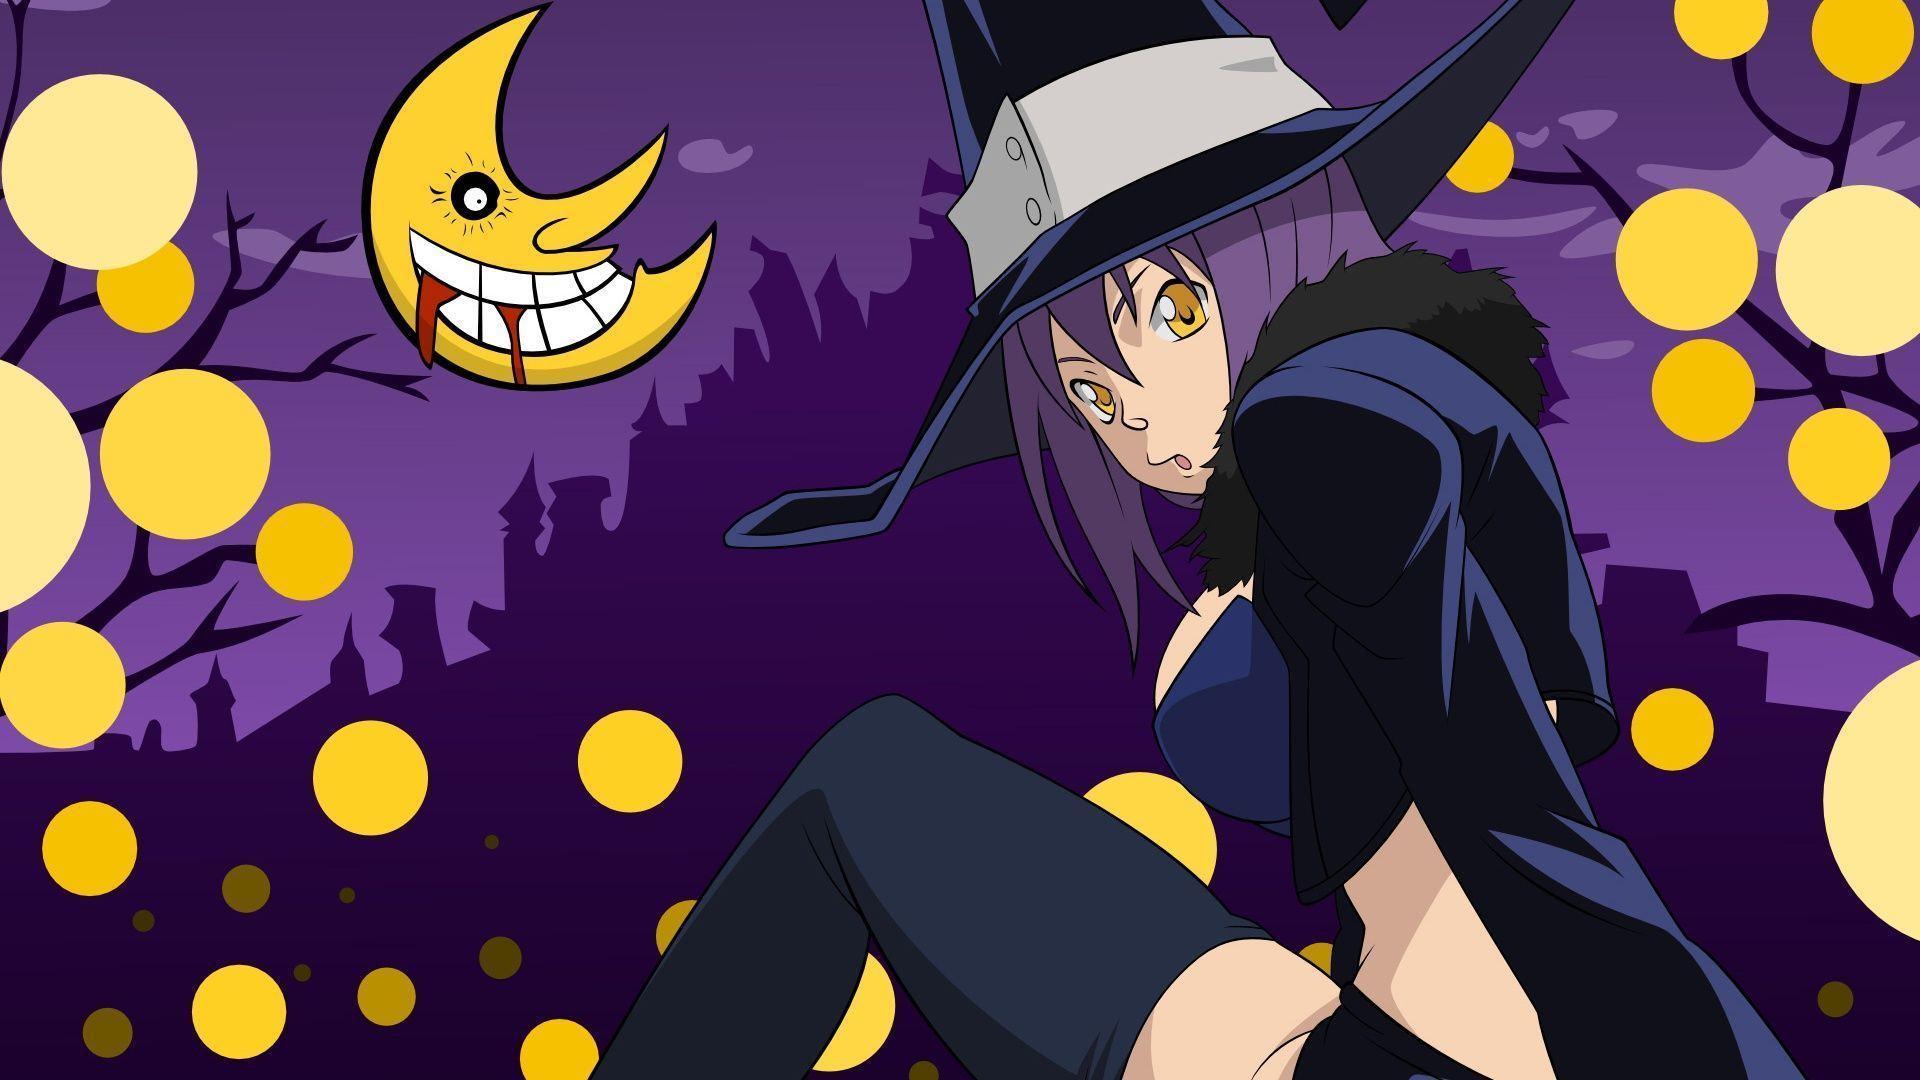 Anime Halloween Wallpapers - Wallpaper Cave